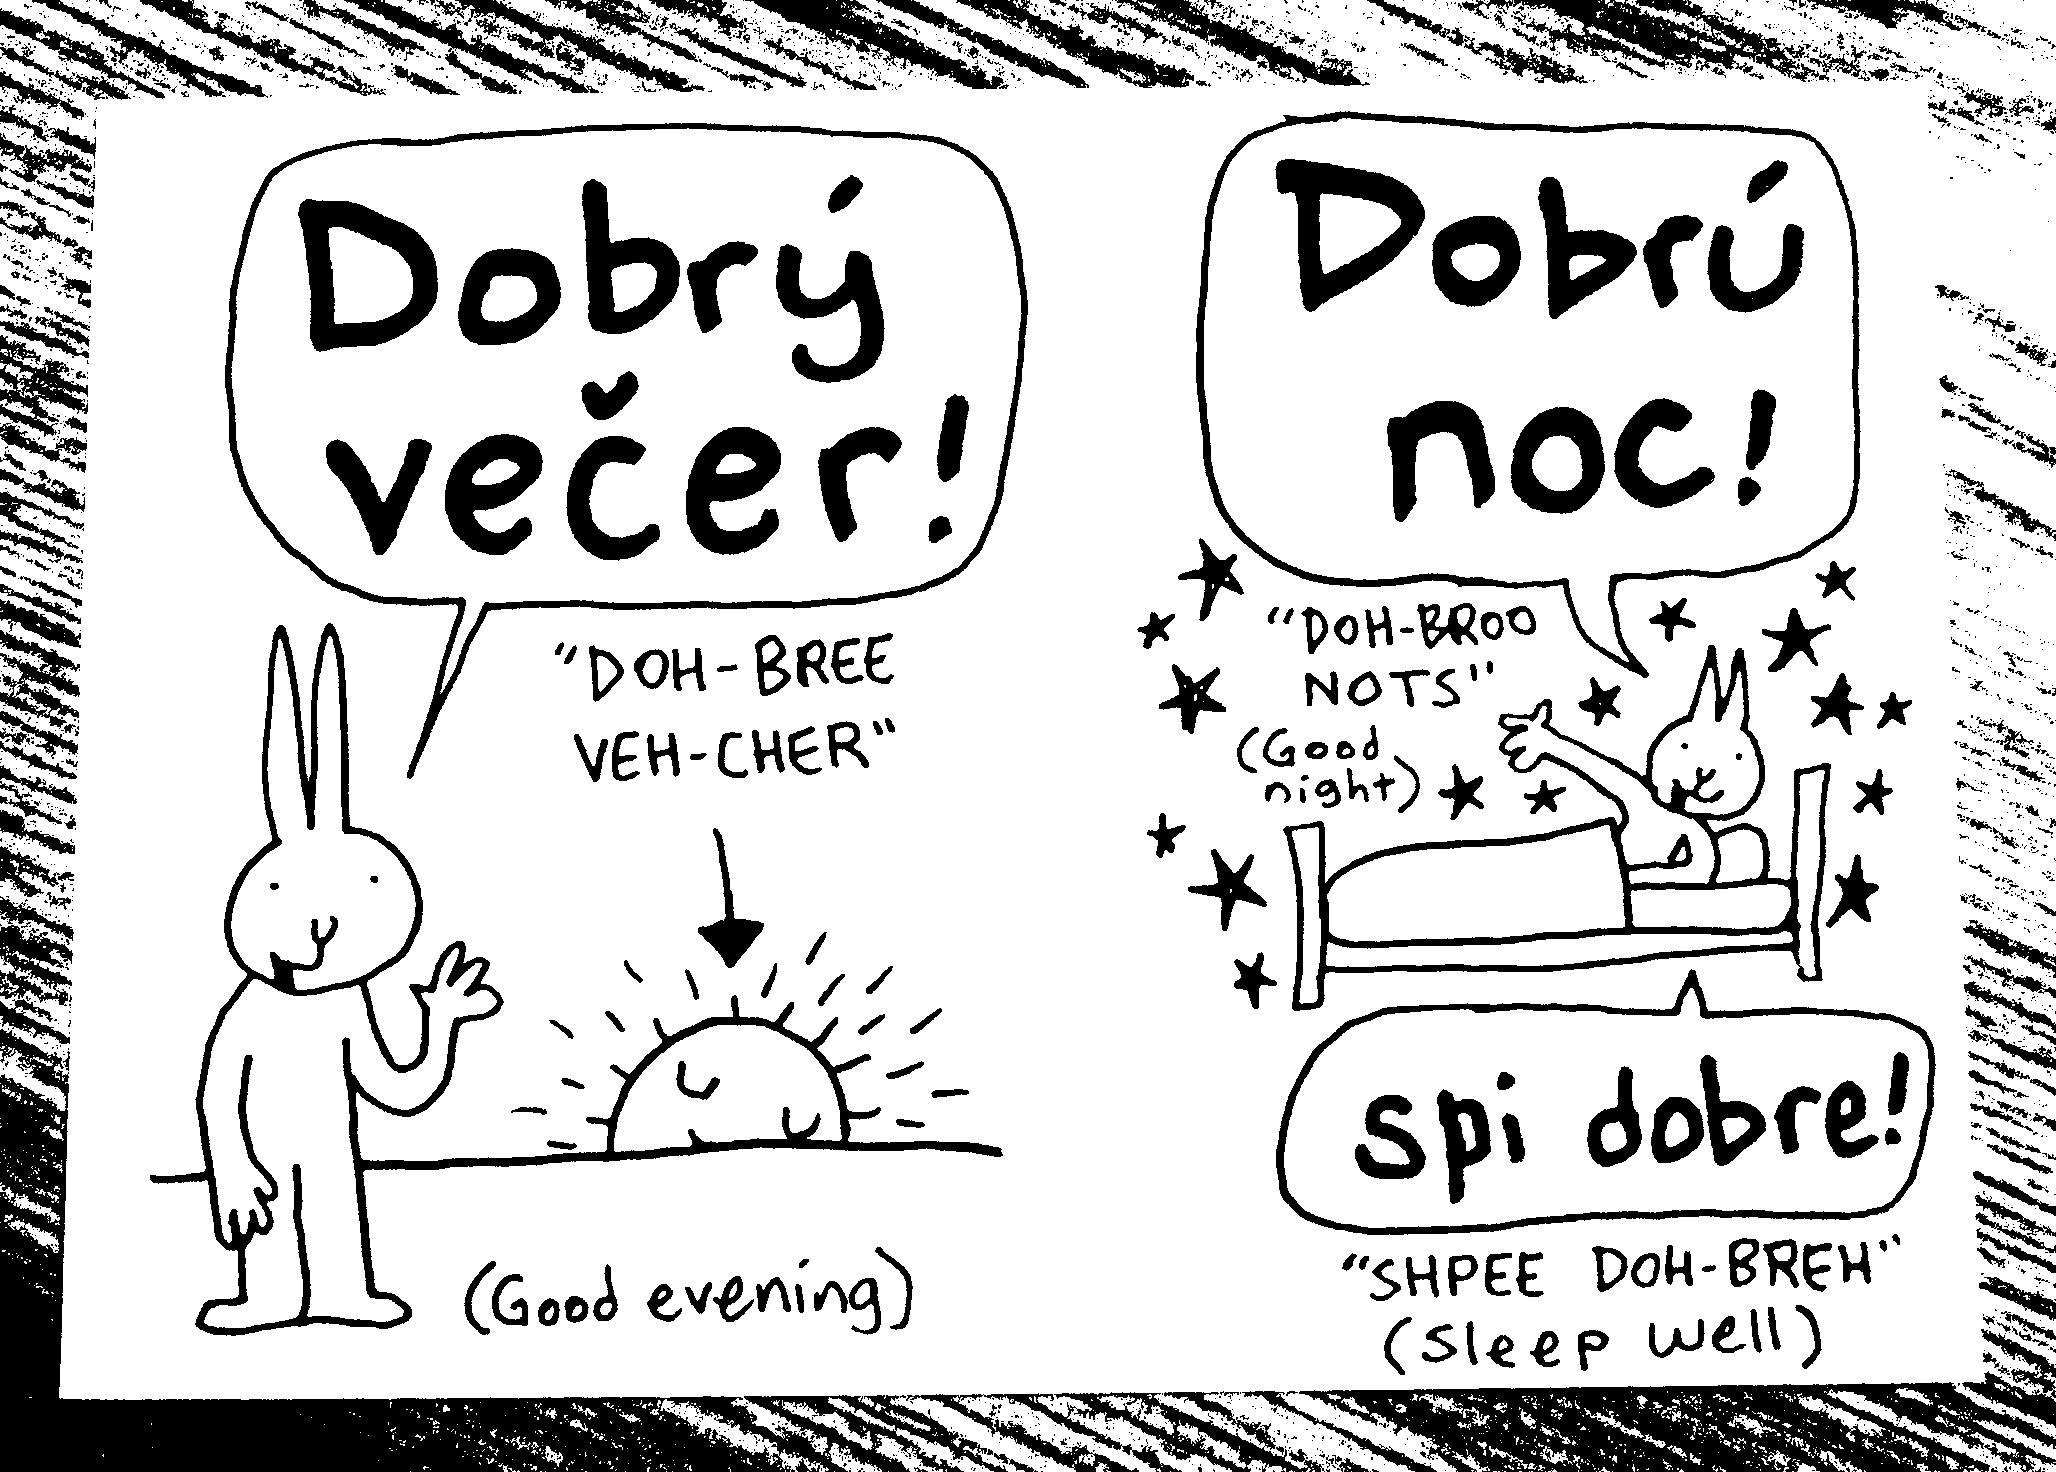 Slovak phrasebook (new mini-comic!)